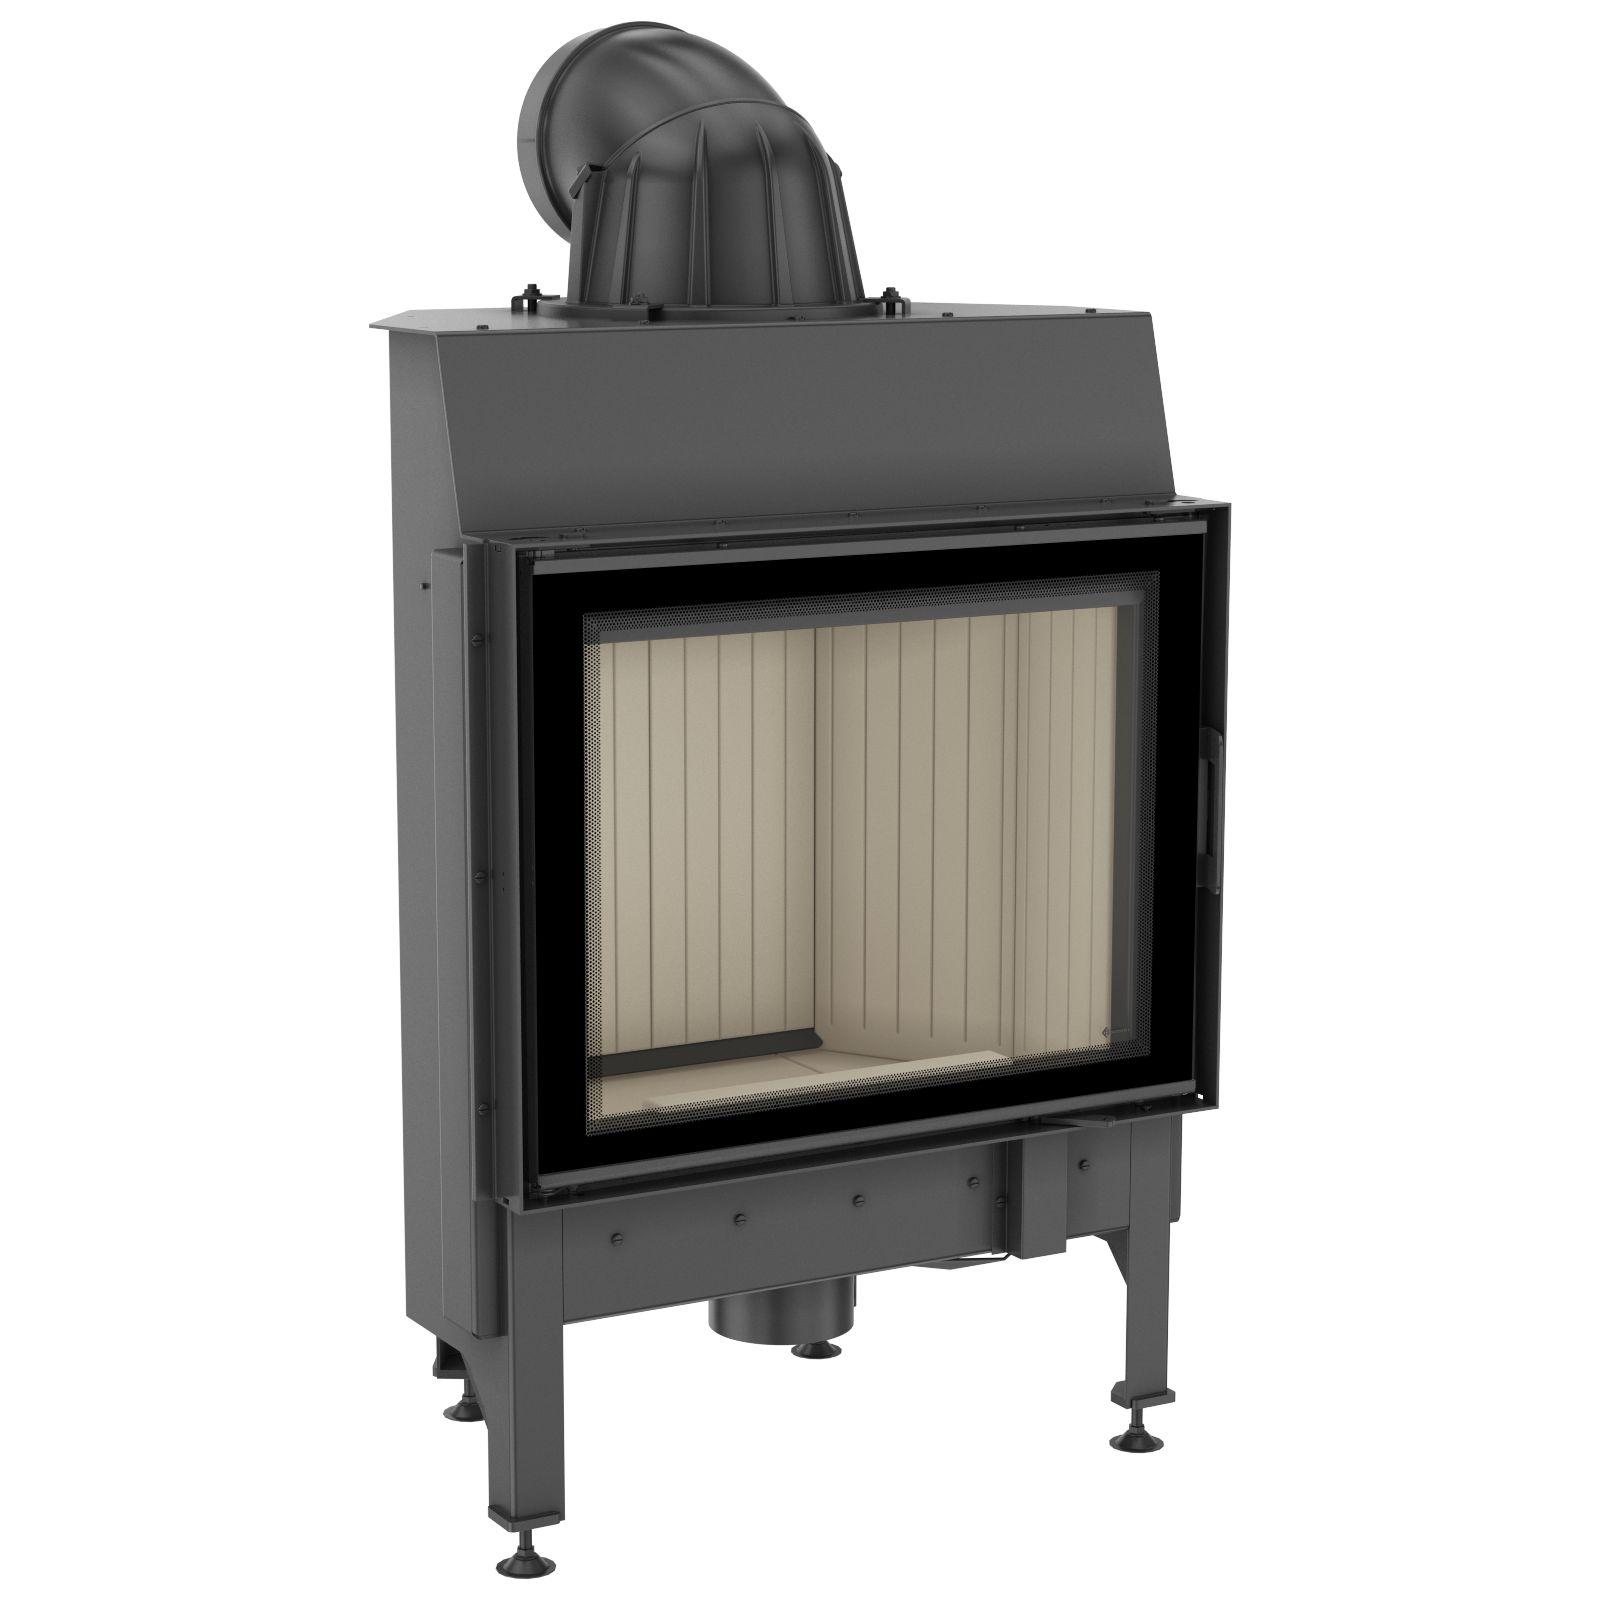 kamineinsatz kratki nadia 10 mit 10 kw. Black Bedroom Furniture Sets. Home Design Ideas